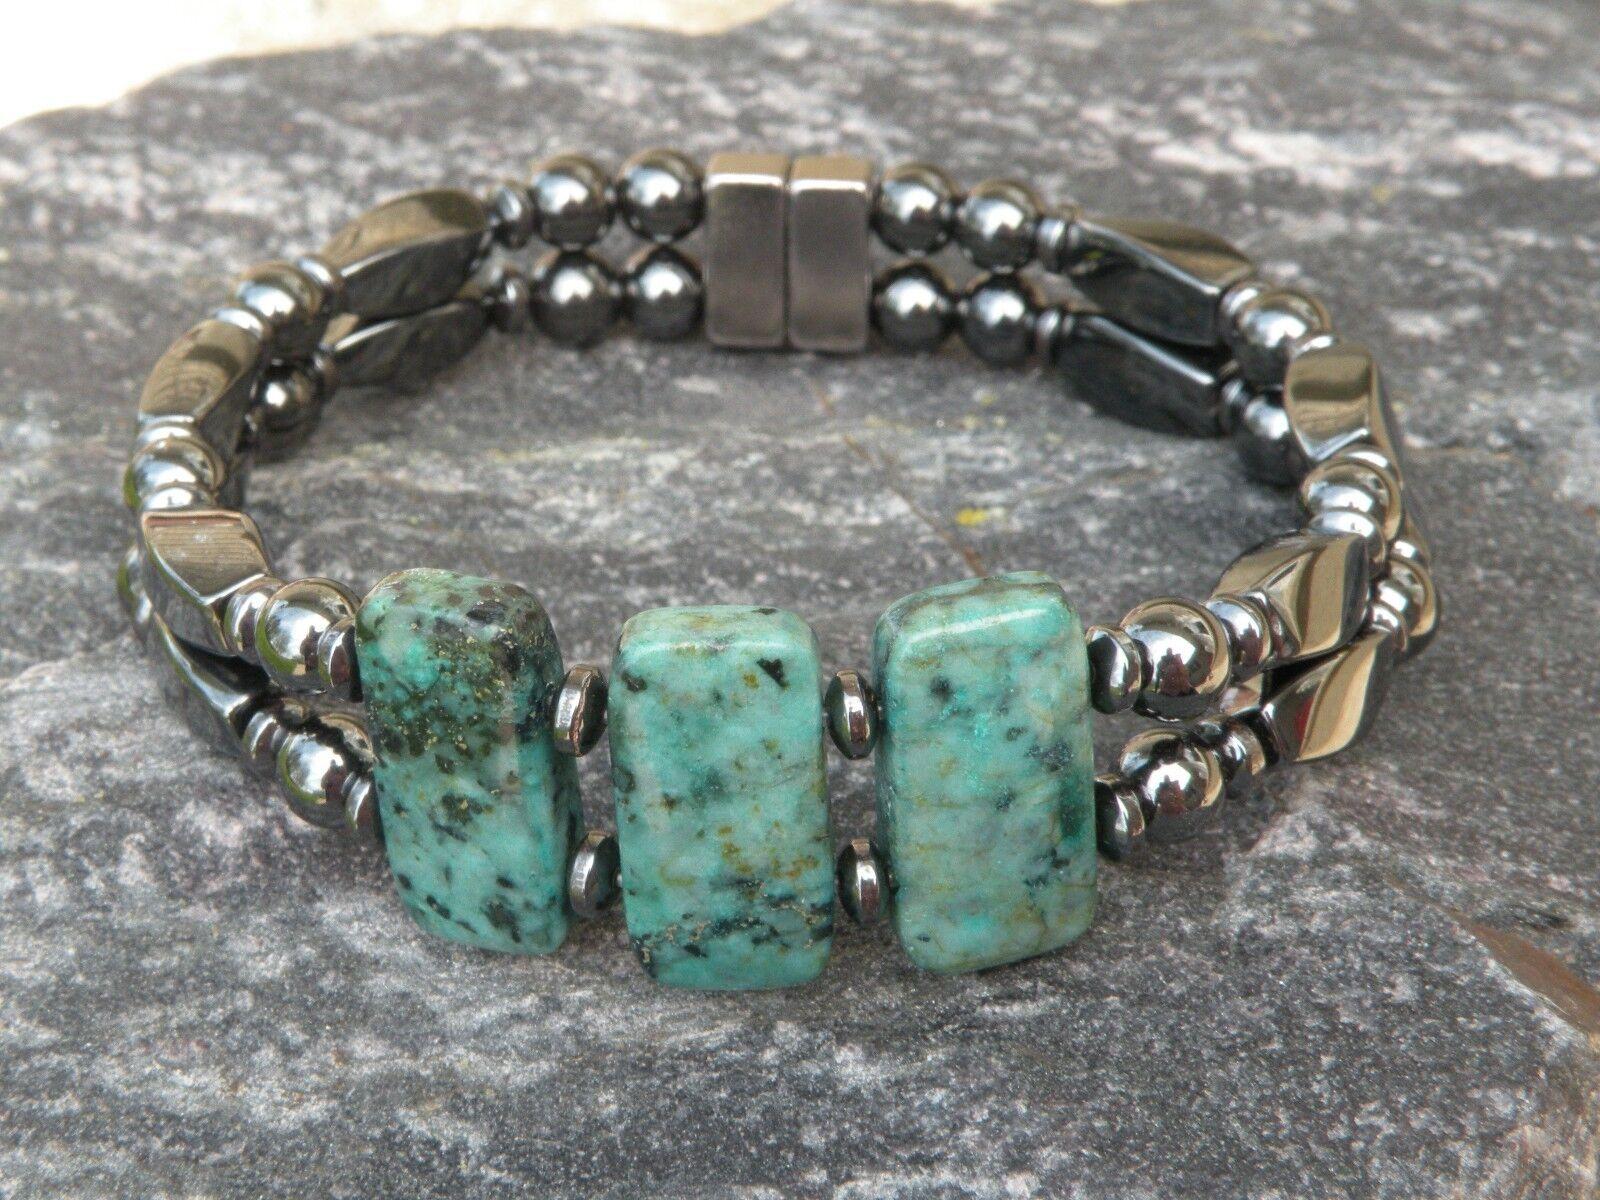 Double Magnetic Hematite Bracelet Anklet 3 AFRICAN TURQUOISE Gemstones 10x20mm